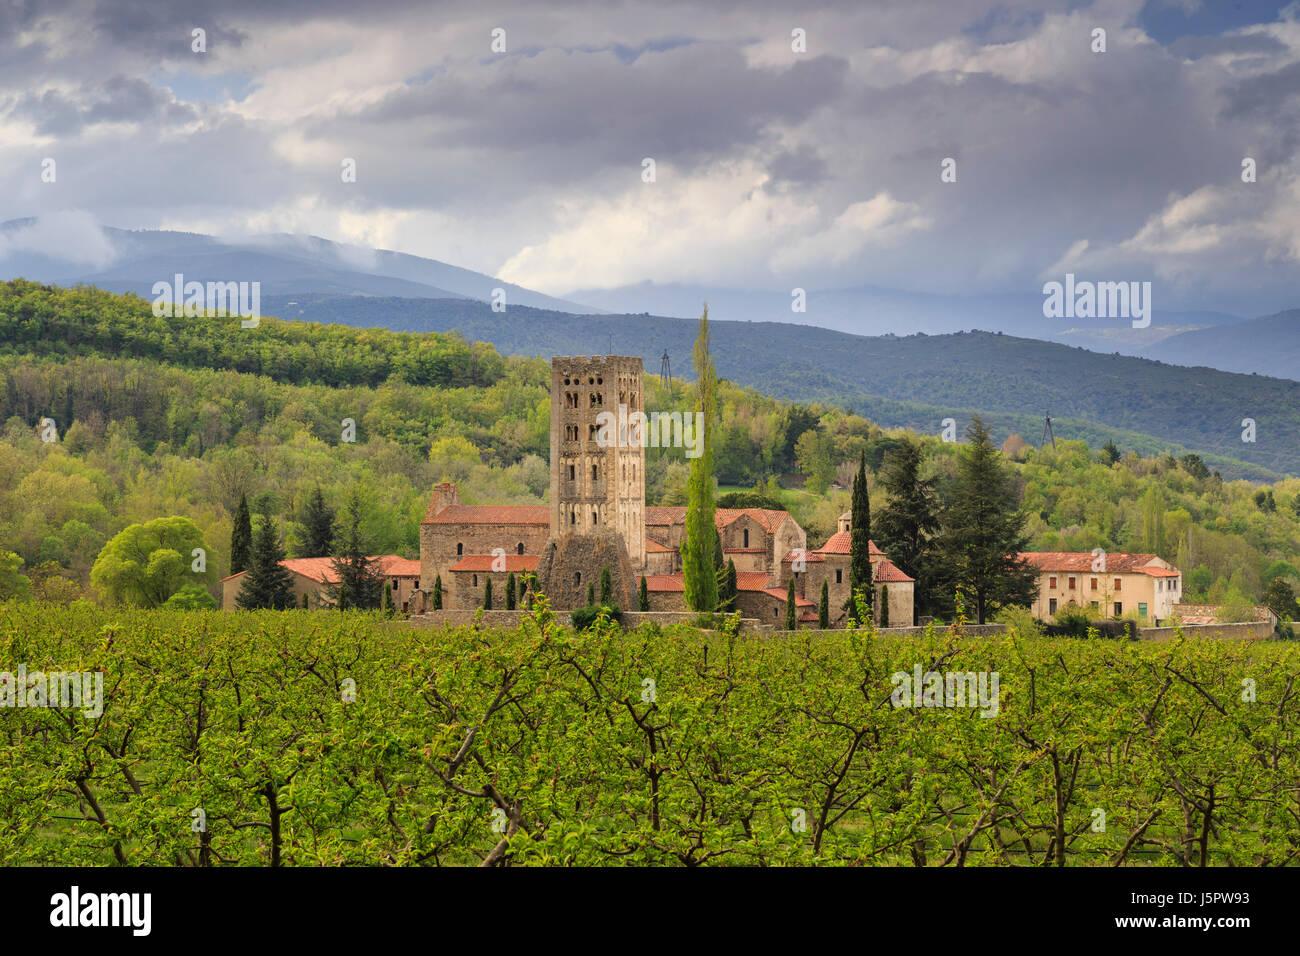 France, Pyrenees Orientales, Codalet, Saint Michel de Cuxa abbey - Stock Image